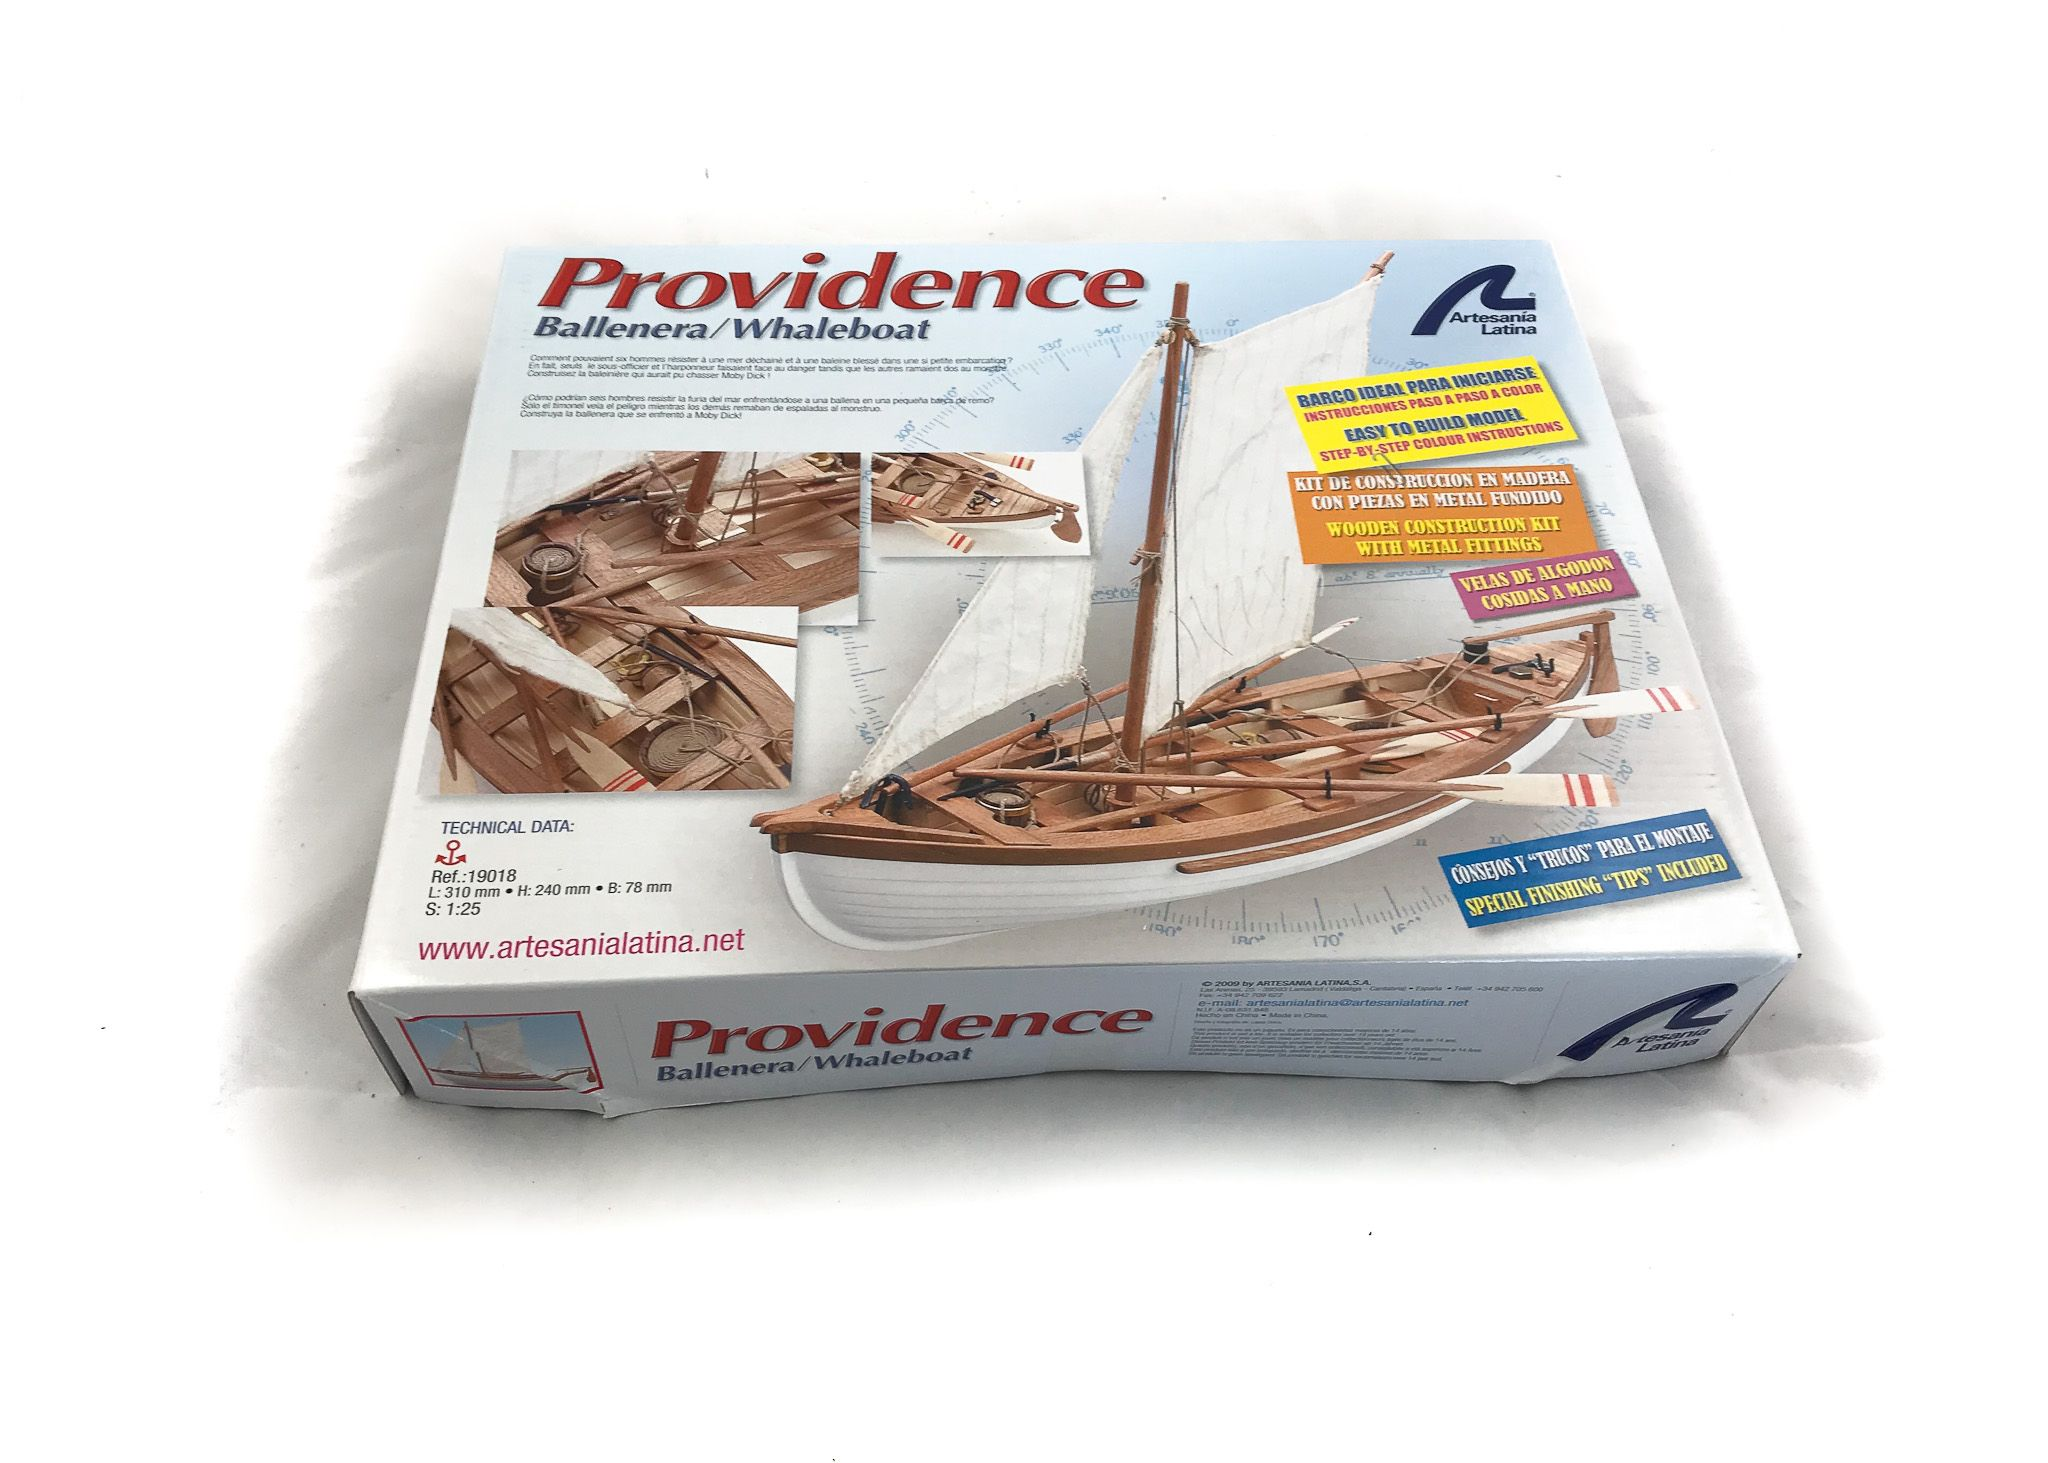 1141-13681-Providence-Whale-Boat-Kit-Artesania-Latina-19018